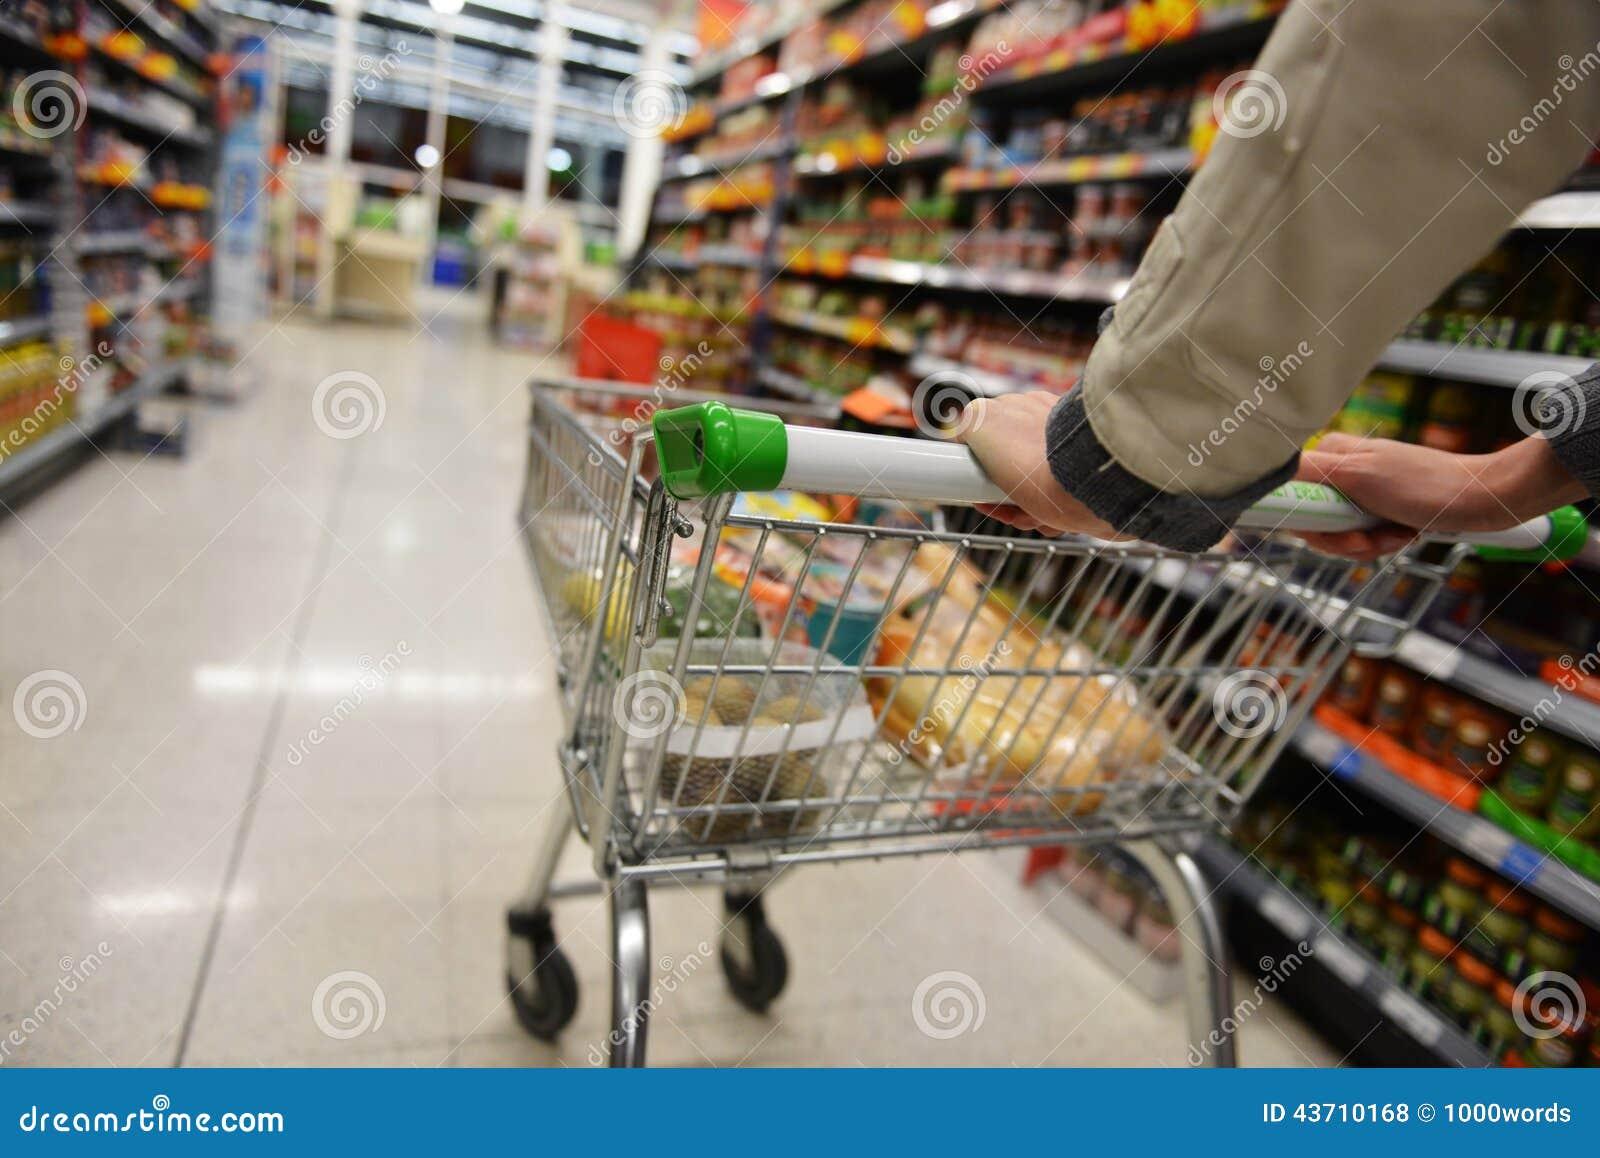 Supermarket Aisle View Stock Photo Image 43710168